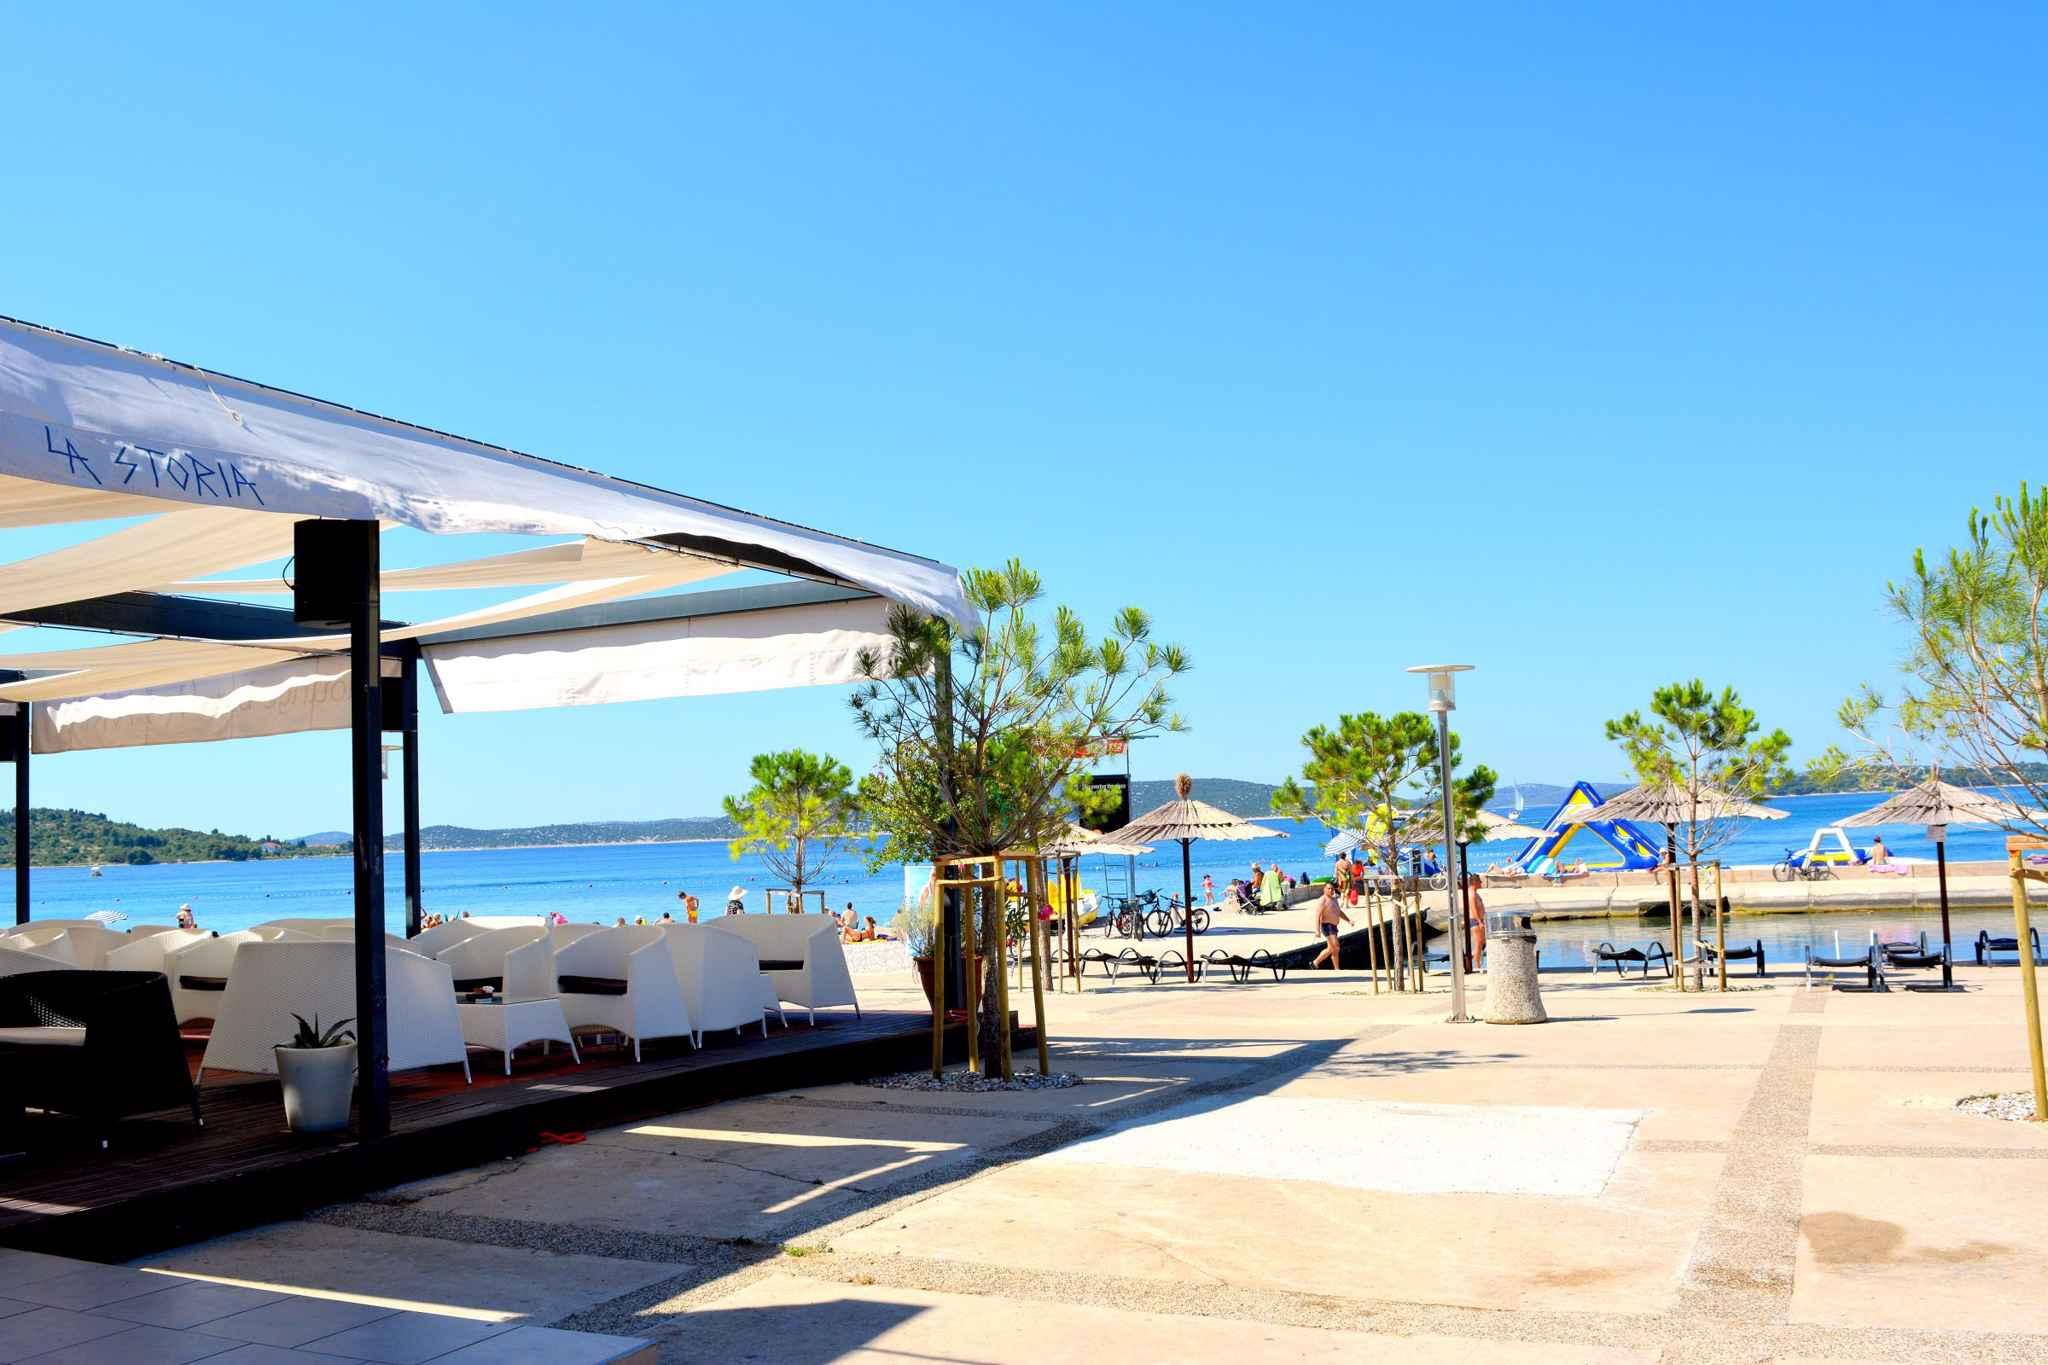 Appartement de vacances mit Terrasse (278775), Vodice, , Dalmatie, Croatie, image 7